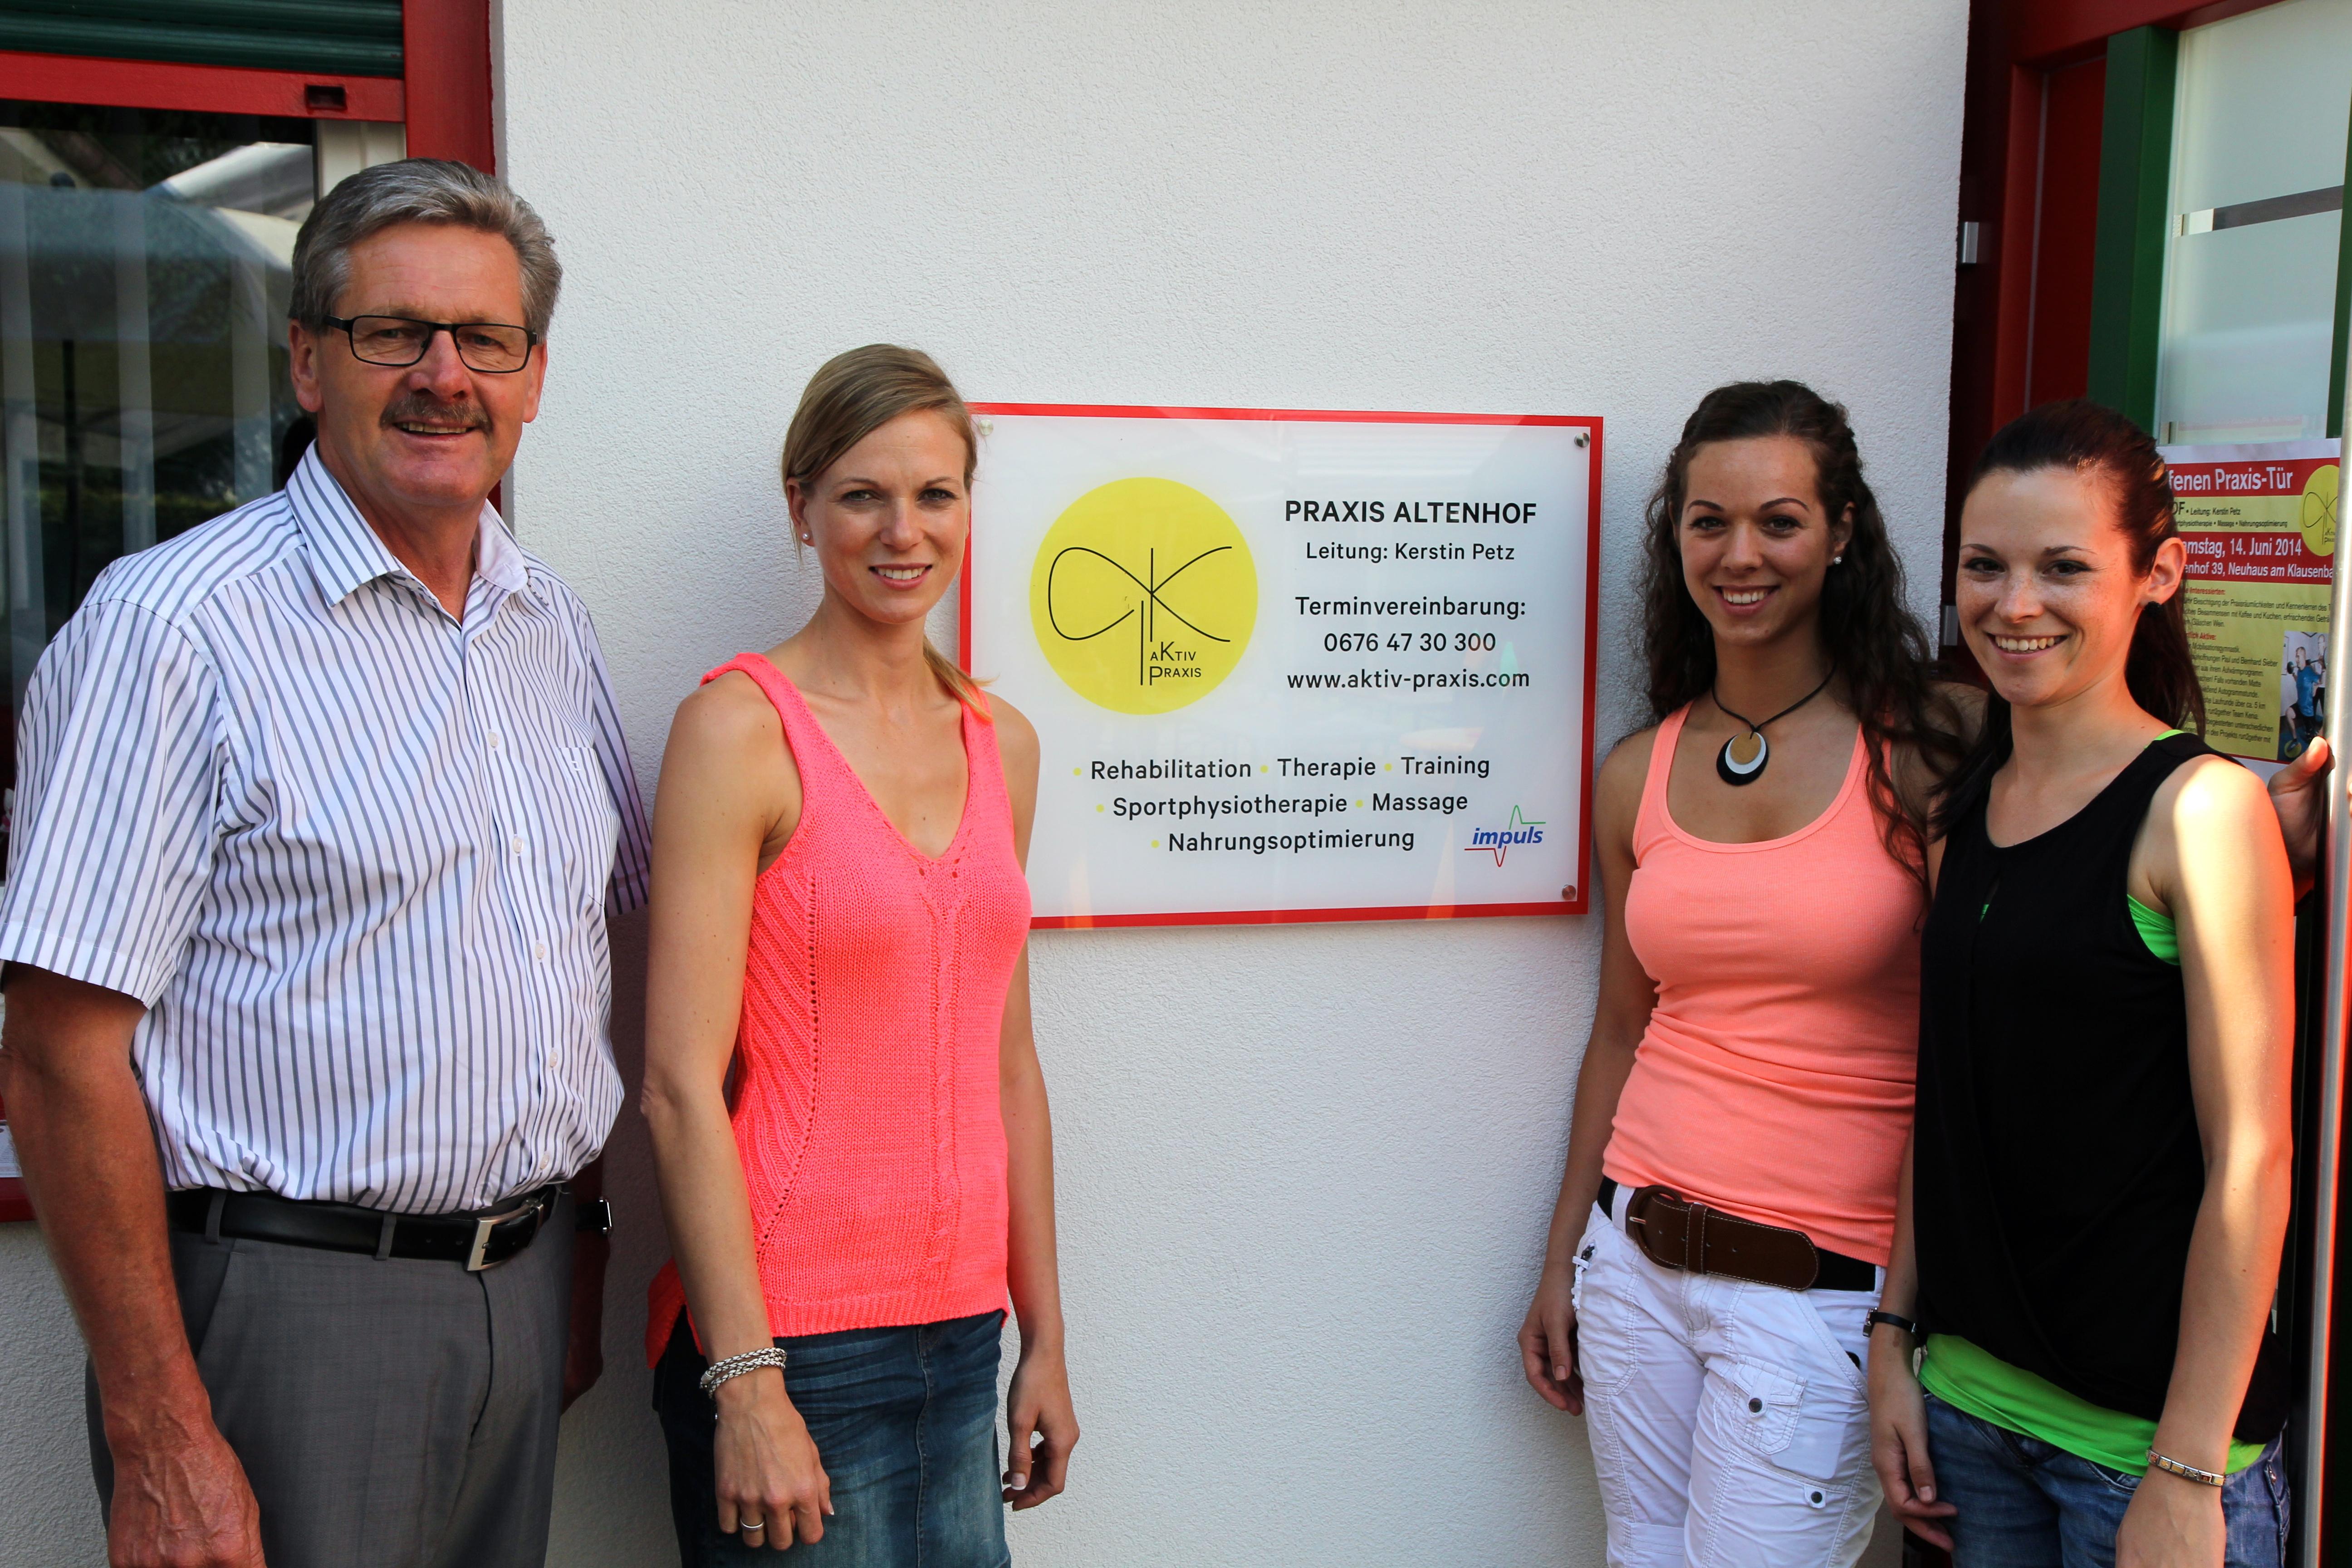 Praxis Altenhof-Team mit Bürgermeister Helmut Sampt